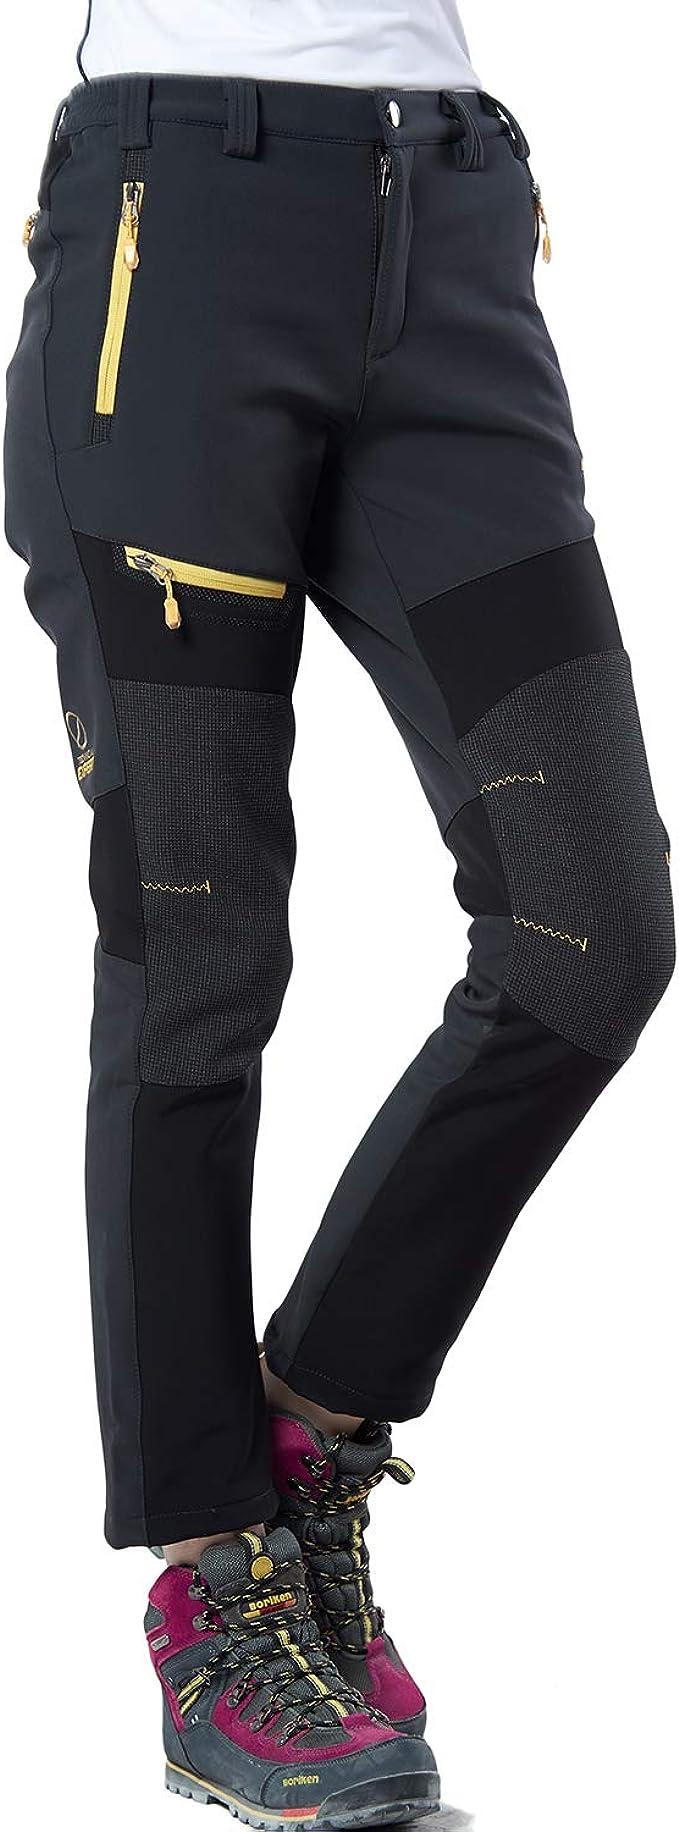 Pantaloni da Trekking da Donna da Esterno Pantaloni Invernali Foderati Traspirante Antivento Pantaloni da Montagna Elastici Trekking Allaperto con Cintura Caldo SANMIO Pantaloni da Donna